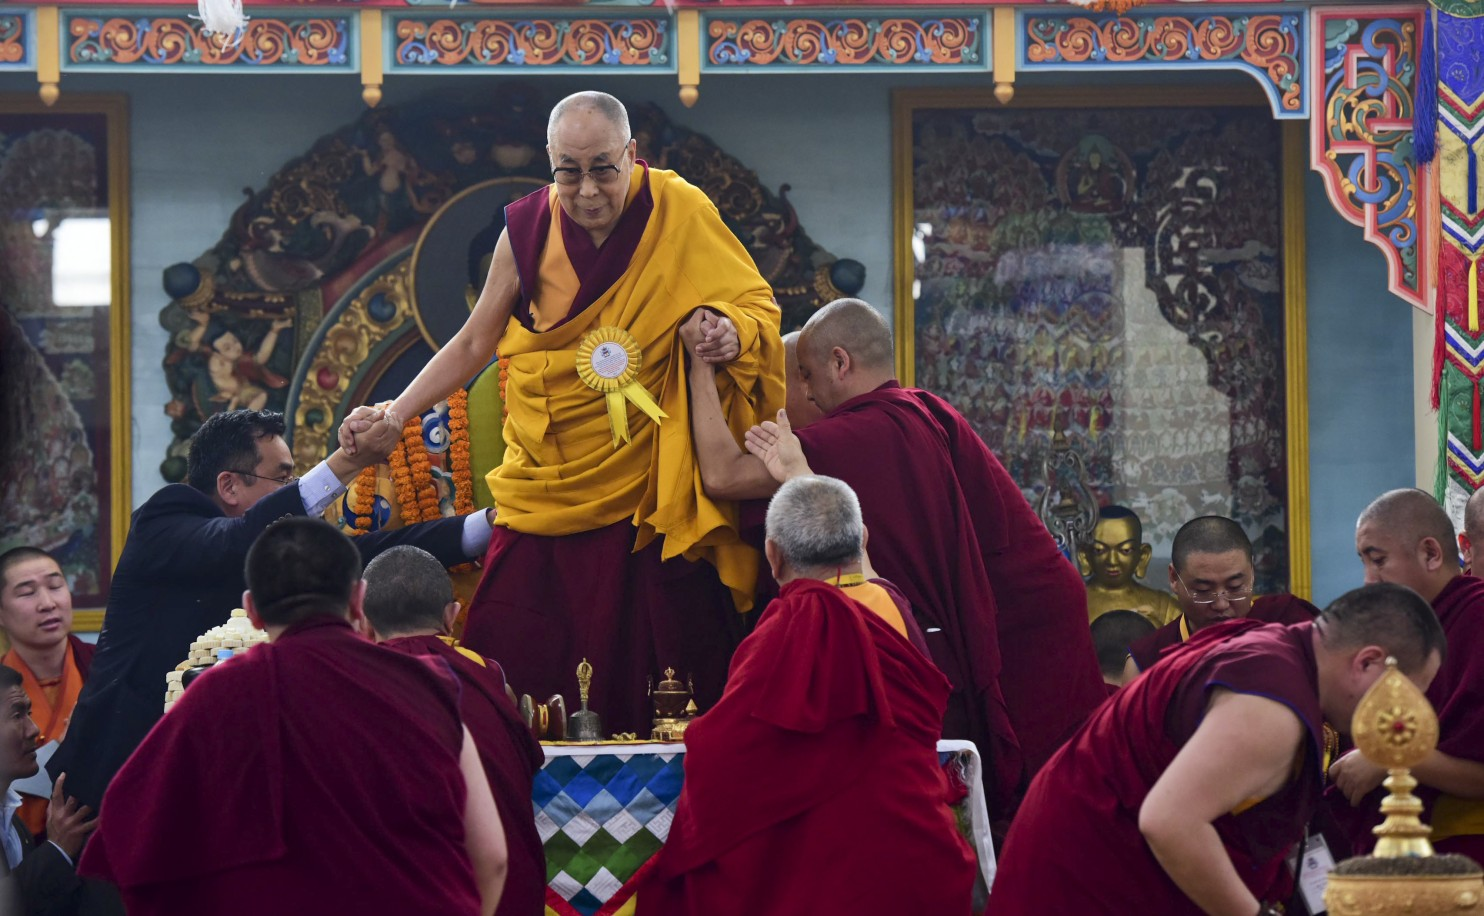 Tibetan spiritual leader the Dalai Lama is assisted by his aides as he prepares to perform rituals during the inauguration of a Mongolian Buddhist temple in Bodh Gaya, India, Jan. 9, 2017. (AP Photo/Manish Bhandari)